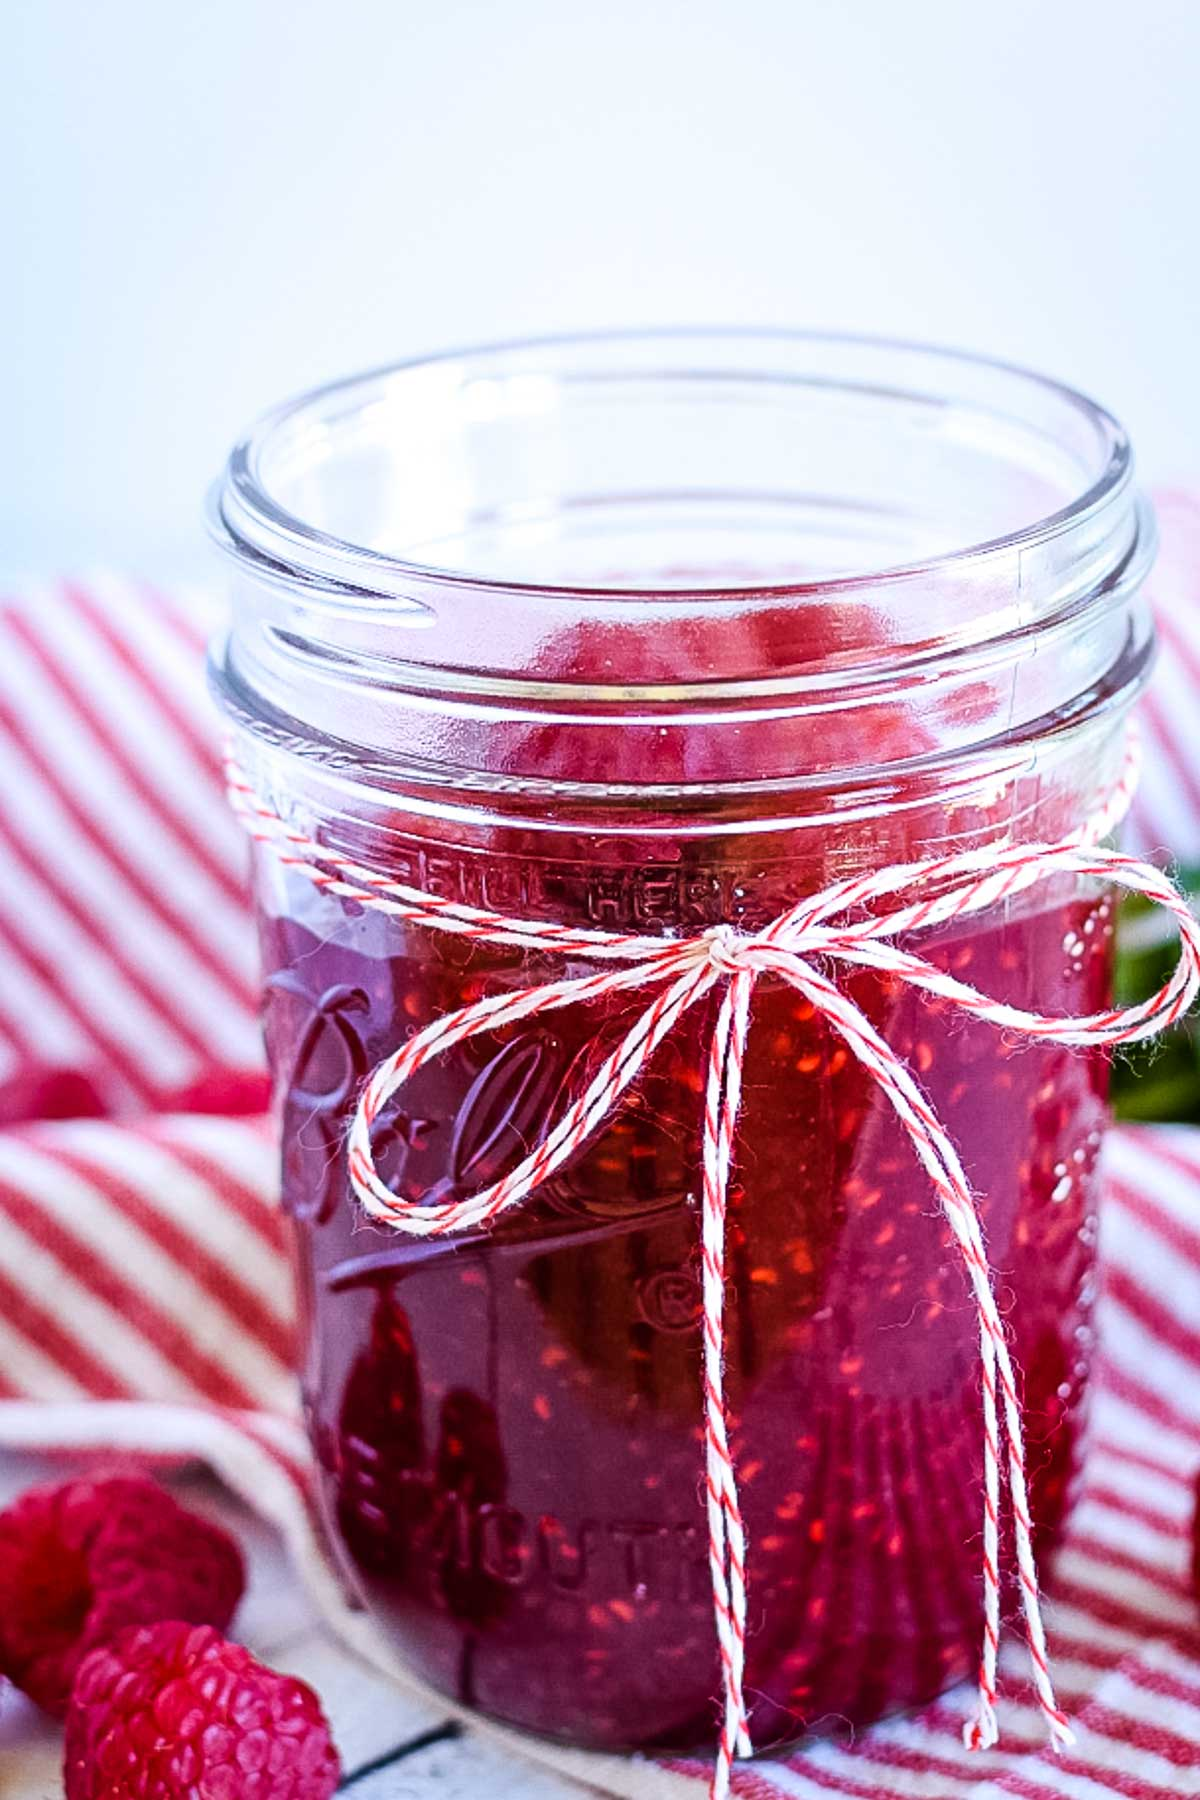 A jar of raspberry dessert topping.